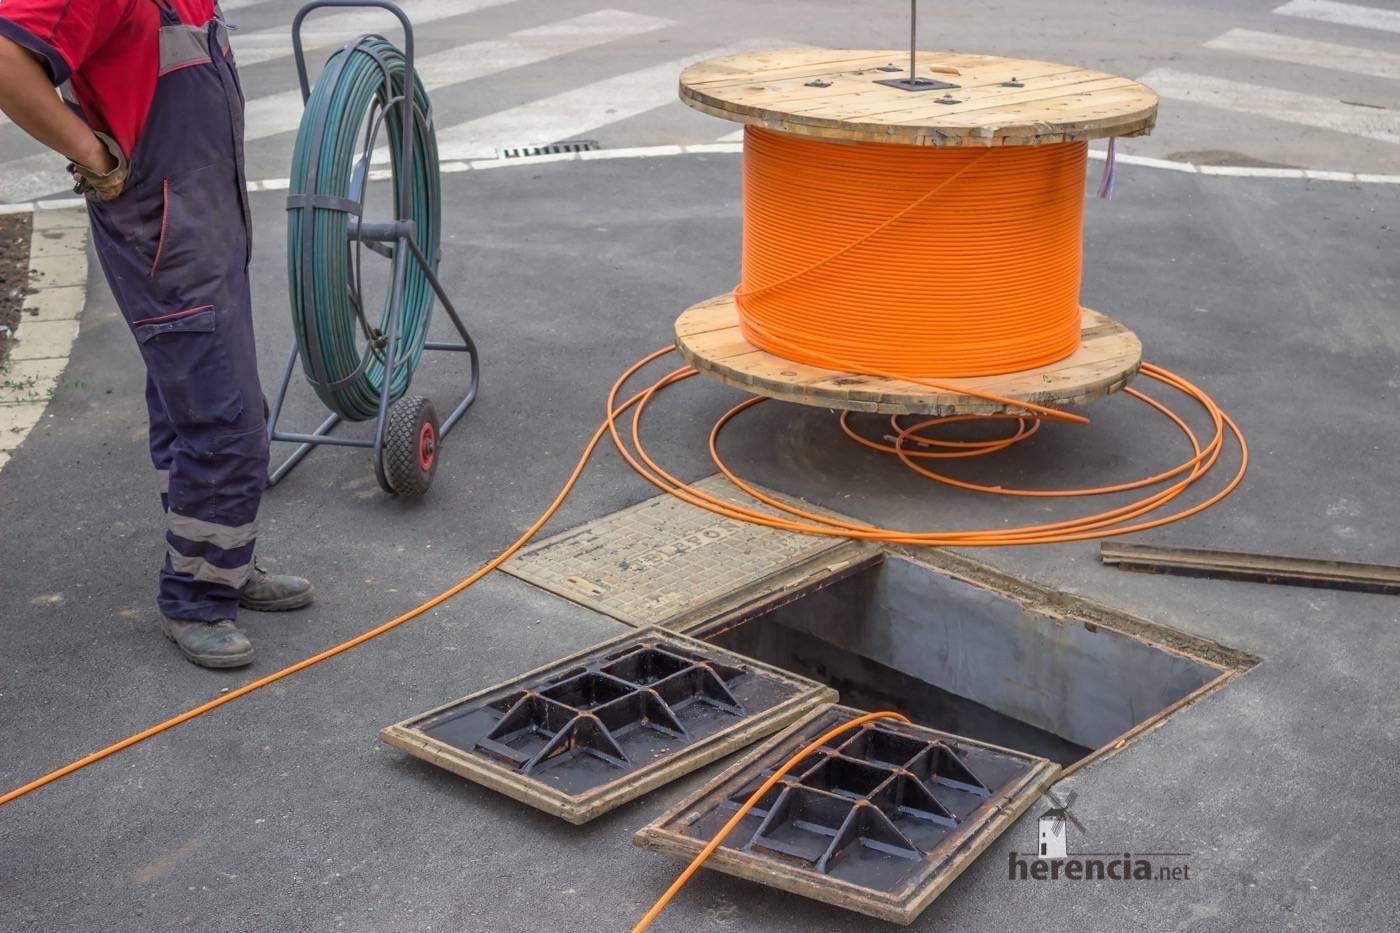 instalacion cable fibra optica en calles 1 - Telefónica cerca de desplegar Fibra Óptica en Herencia